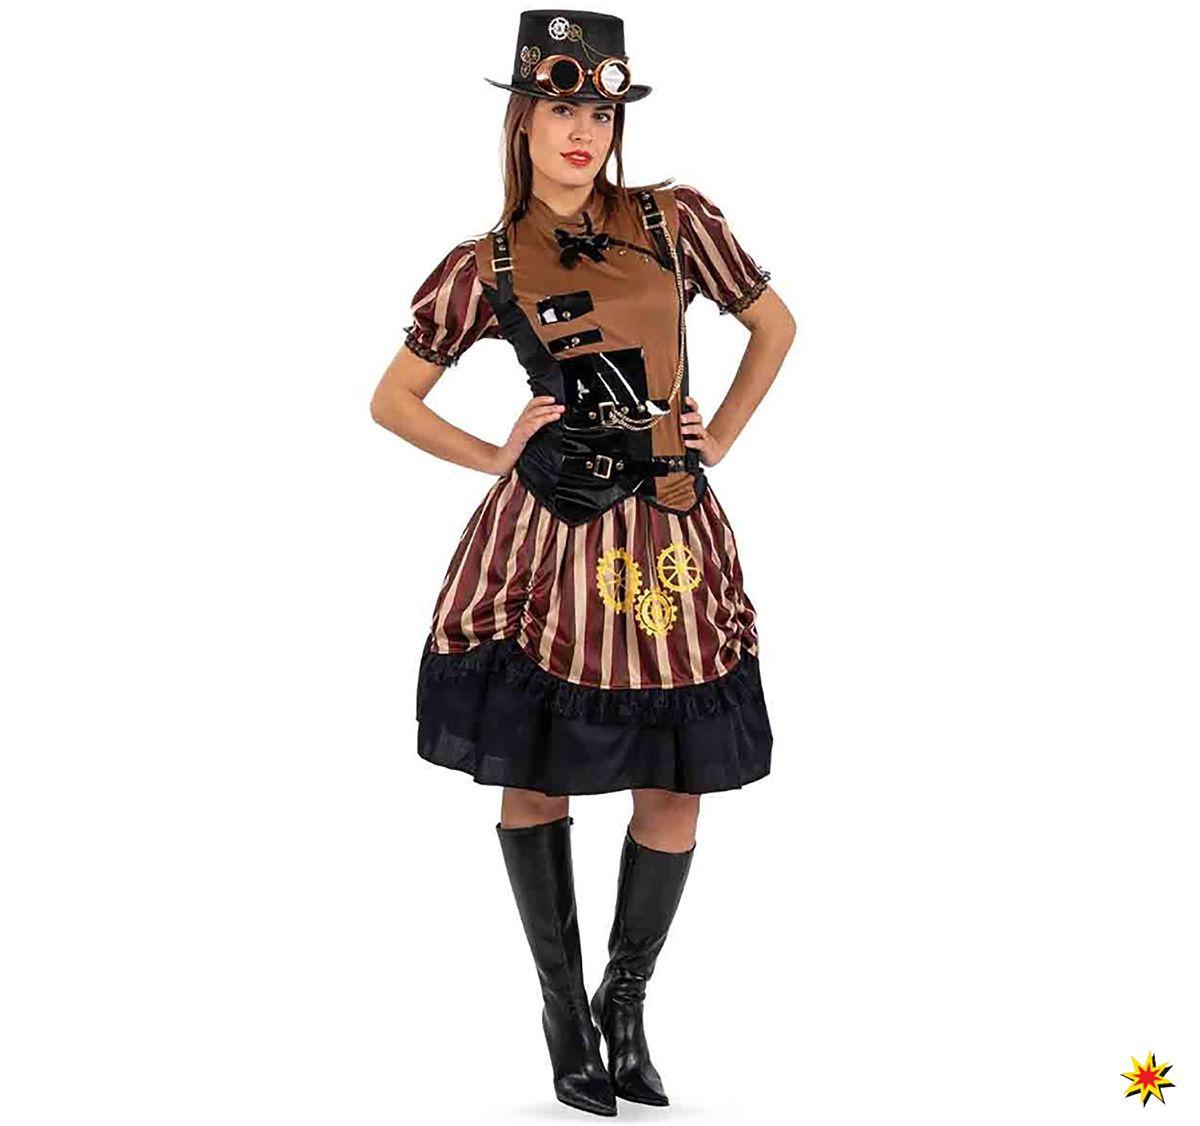 damen kostüm steampunk lady, kleid